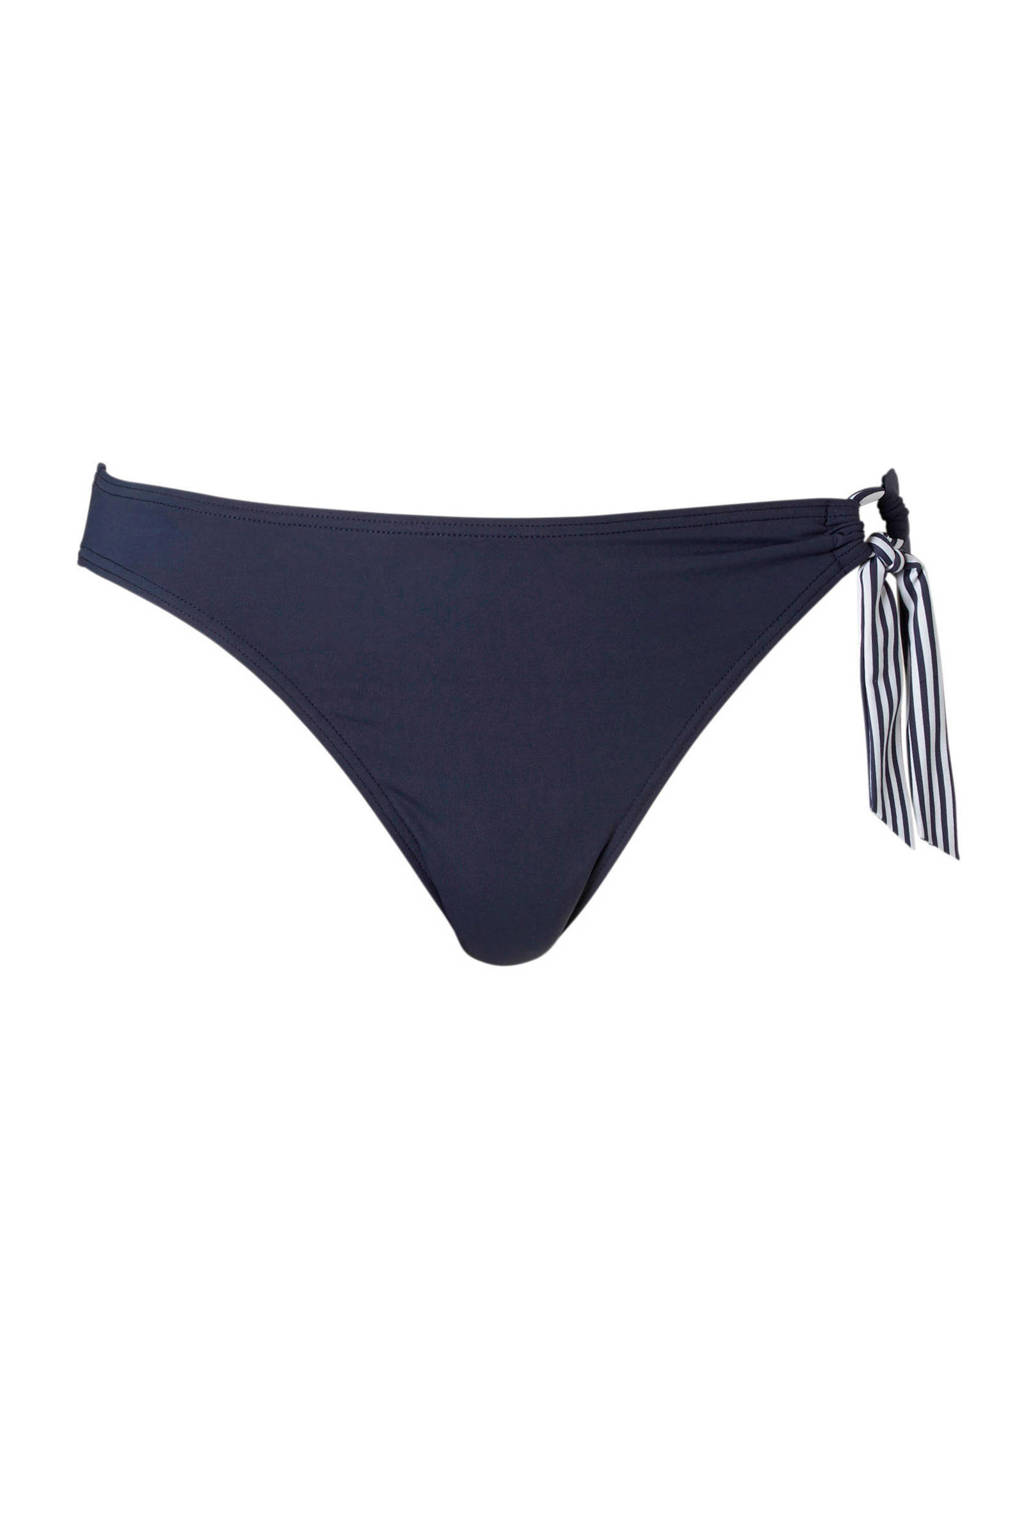 ESPRIT Women Beach bikinibroekje met heup detail blauw, Blauw